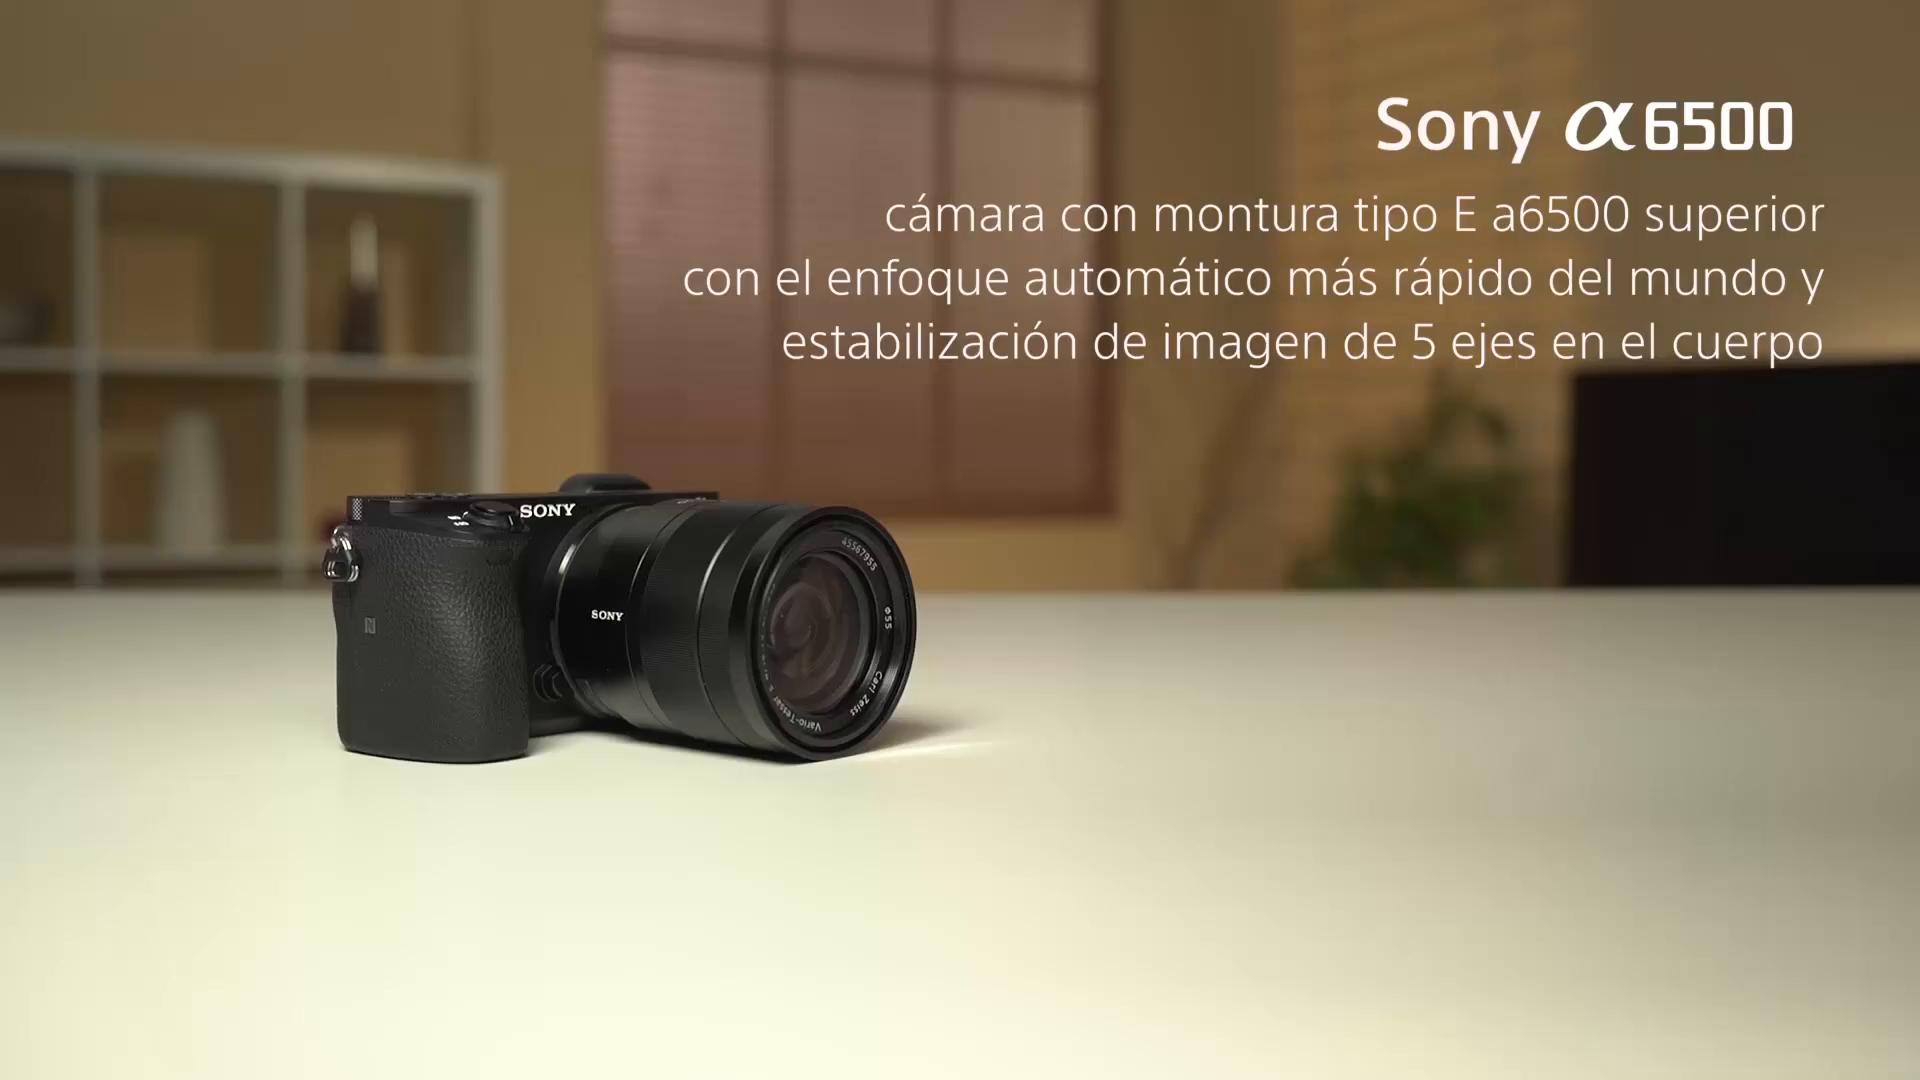 Sony Alpha ILCE6500ZBDI - Cámara (24.2 MP, 11fps, 5 ejes, AF de ...